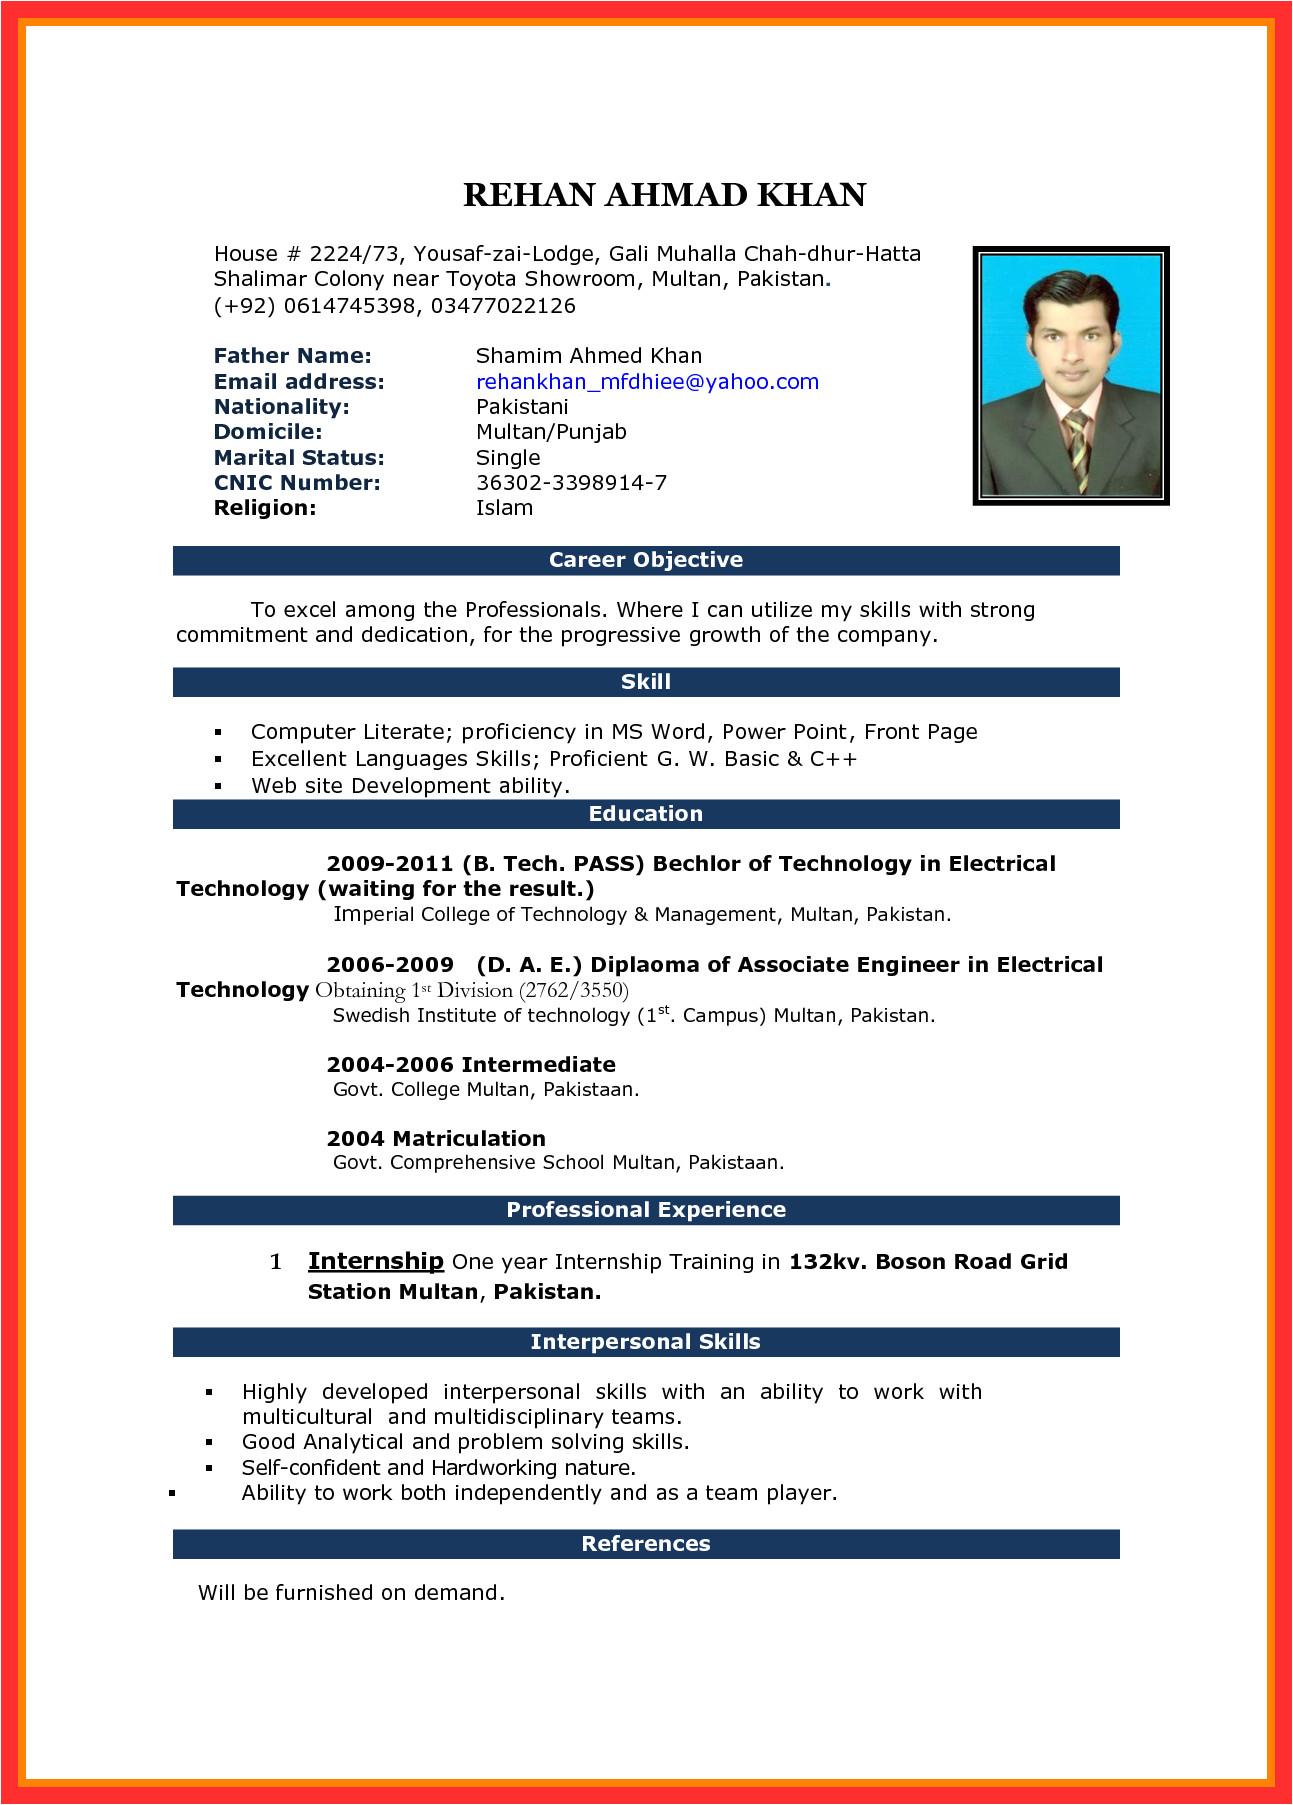 Latest Resume format In Word Latest Resume Sample Good Resume format